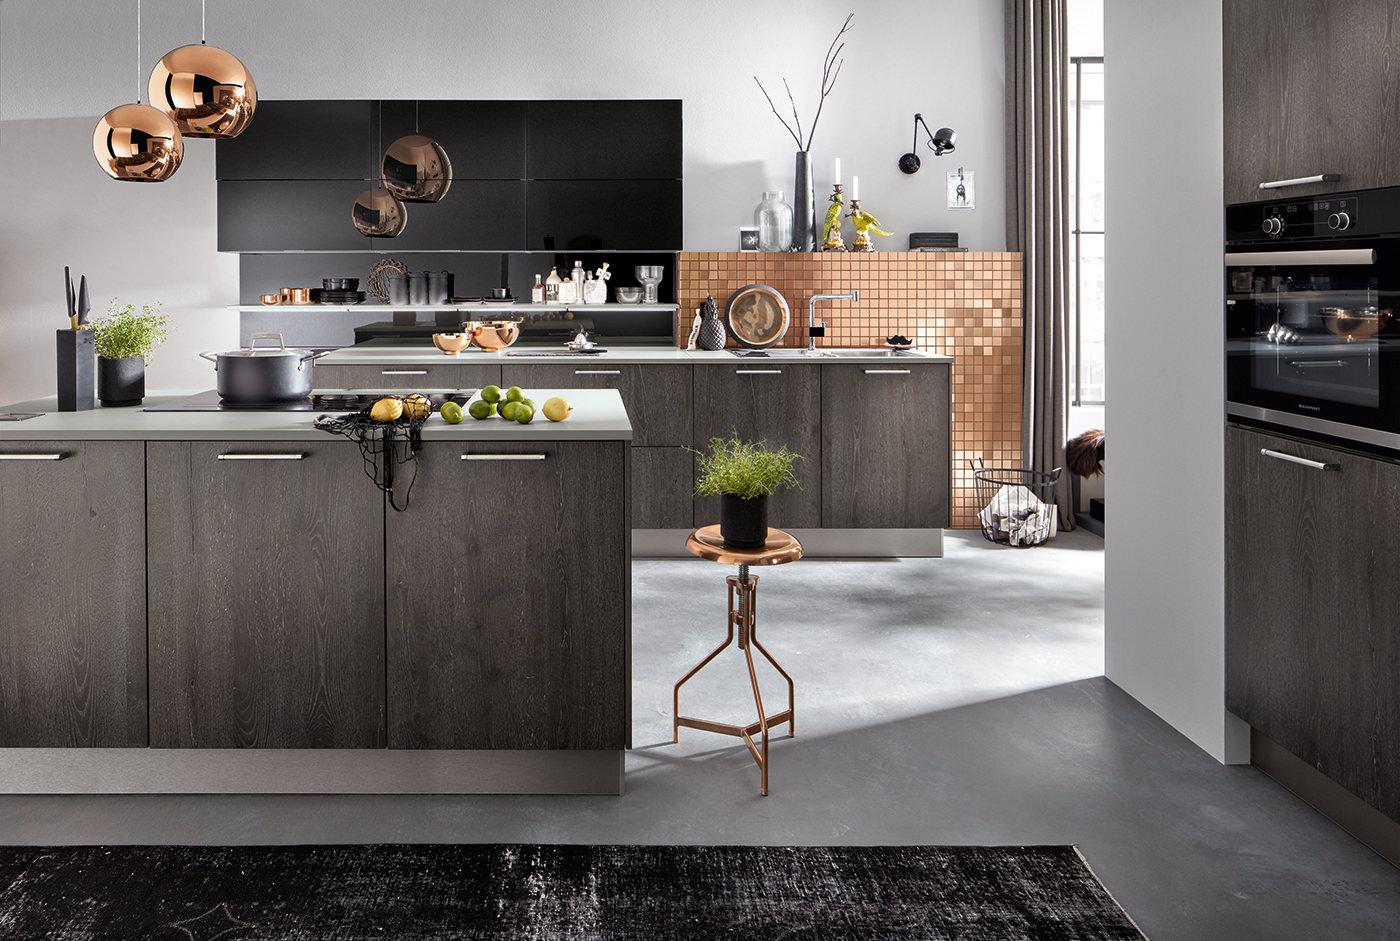 Küchen kaufen in Münster, Coesfeld, Senden  Disseler